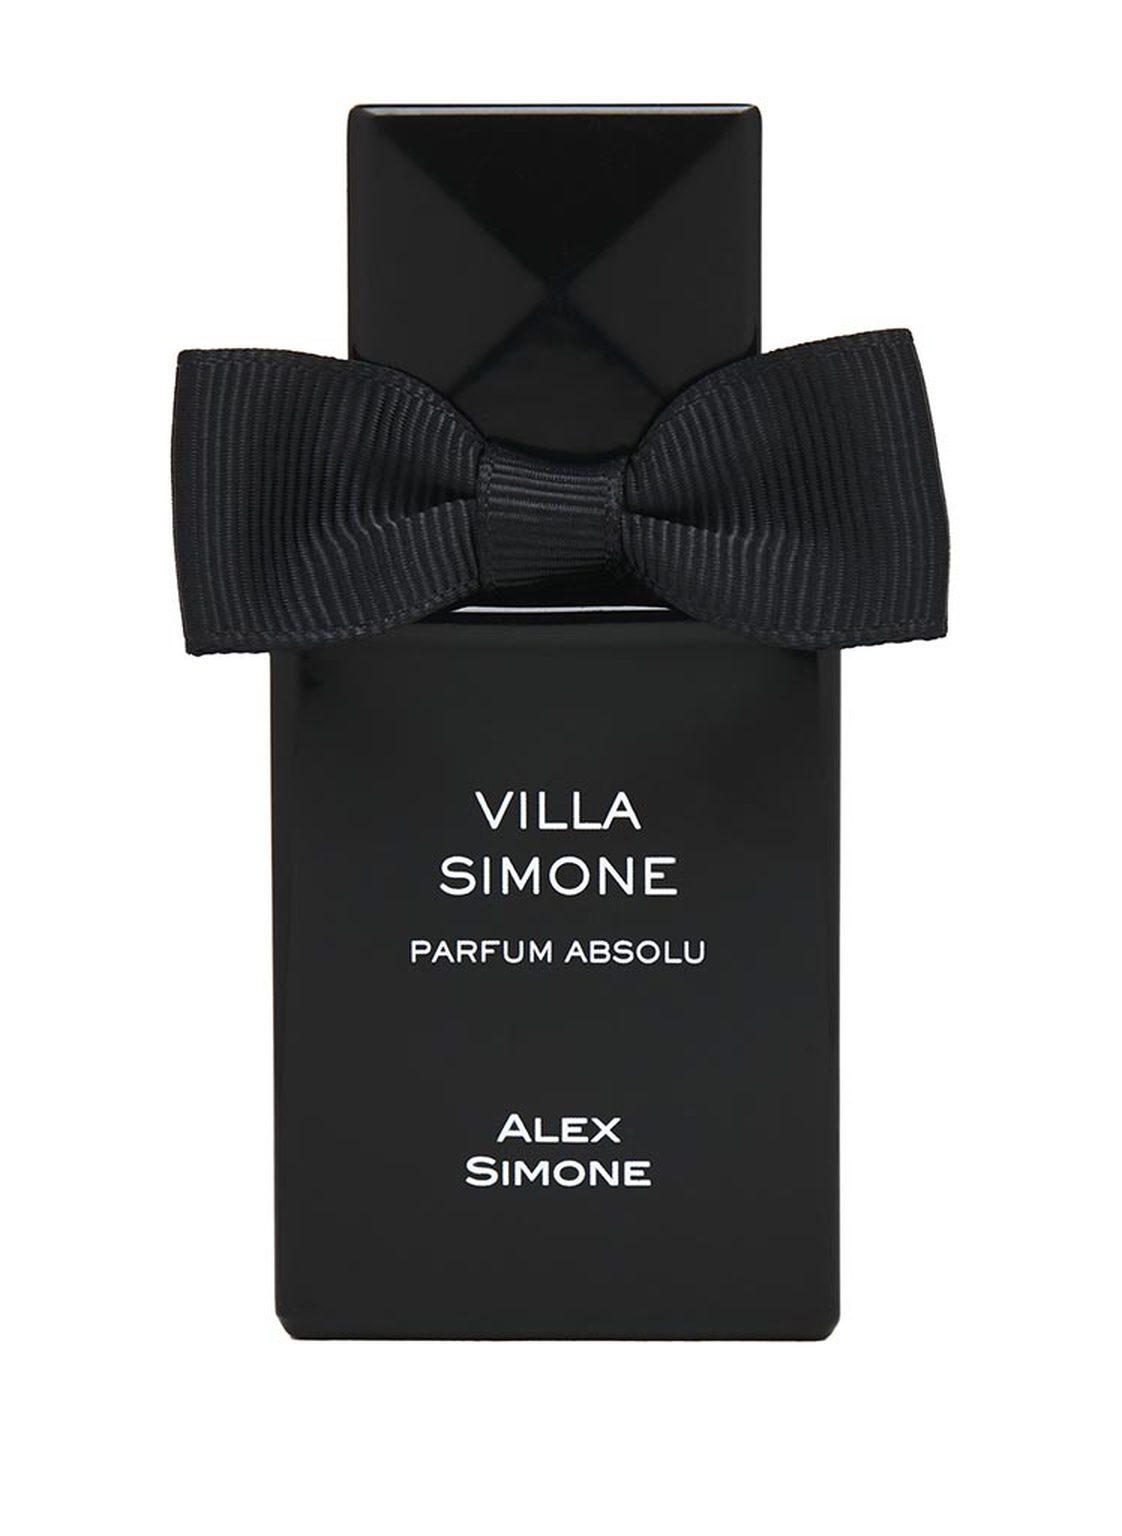 Image of Alex Simone Villa Simone Parfum Absolu Eau de Parfum 30 ml